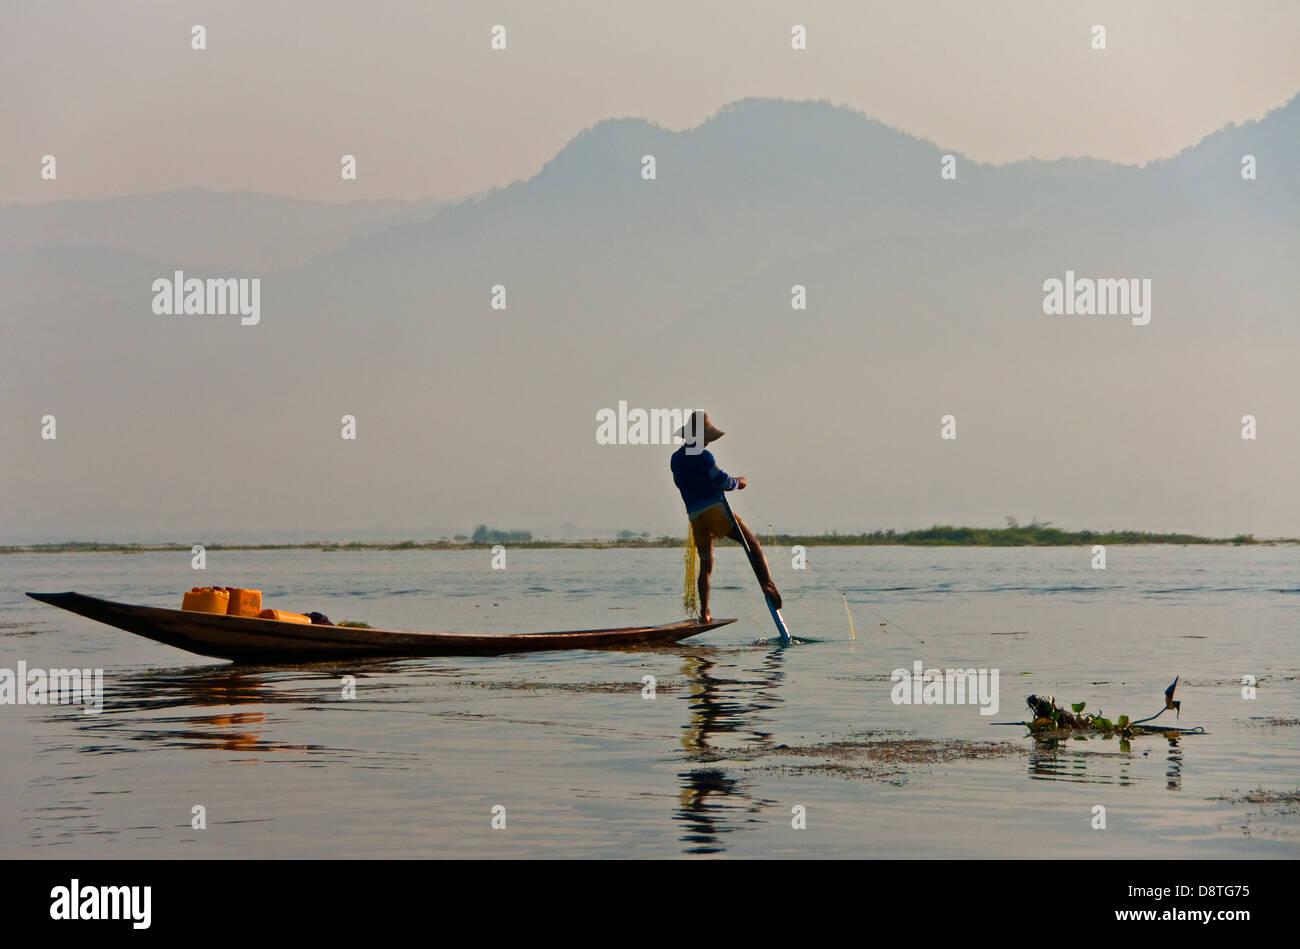 Gamba-rower pescatore sul Lago Inle, Stato Shan, Myanmar. Immagini Stock